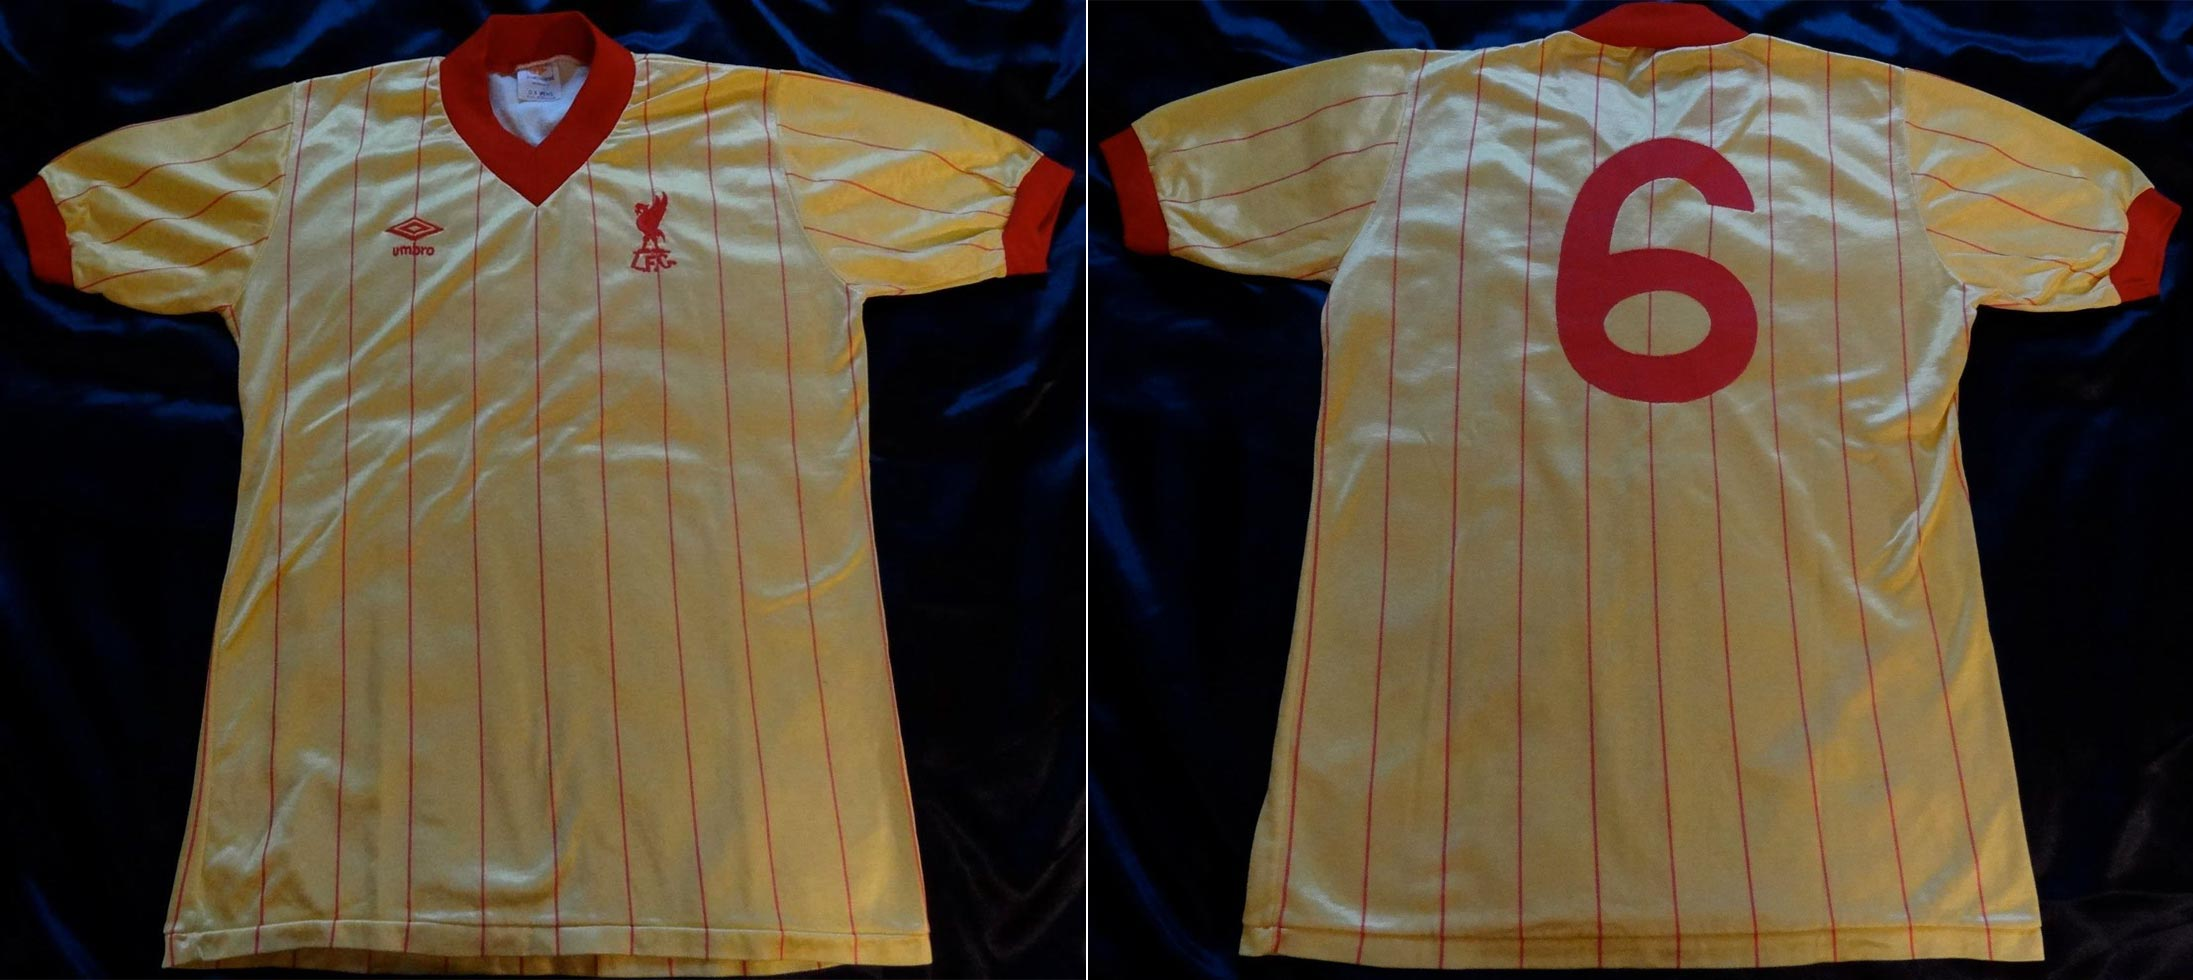 c1ed1a1a2a7 1982-83 Away player shirt short sleeve № 6 Alan Hansen (without CROWN  PAINTS logo